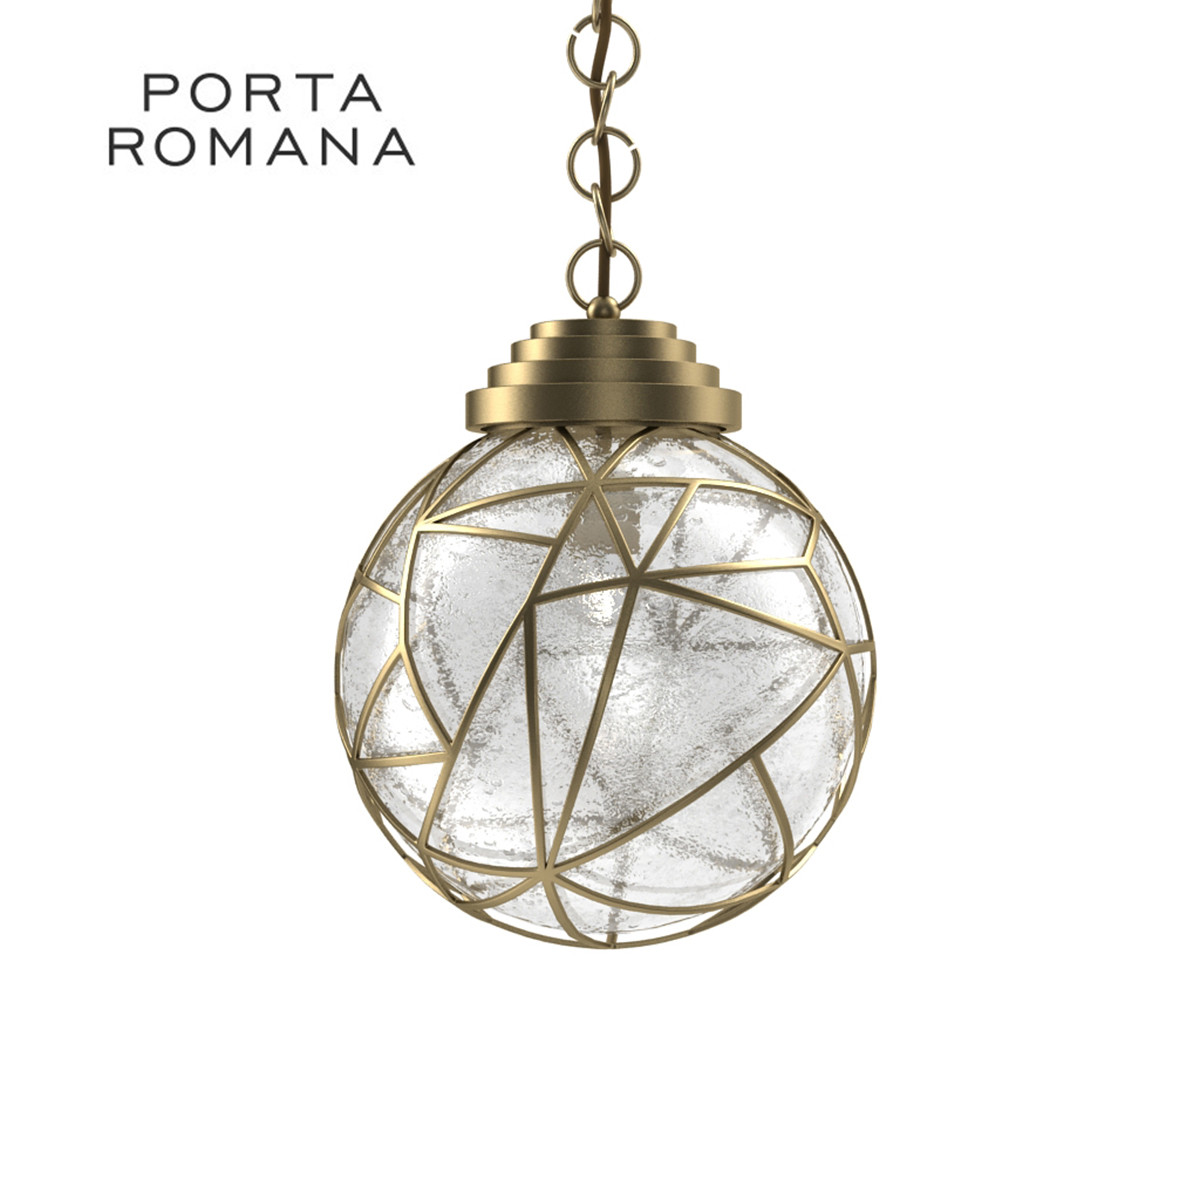 Porta Romana Mcl42 3d Model